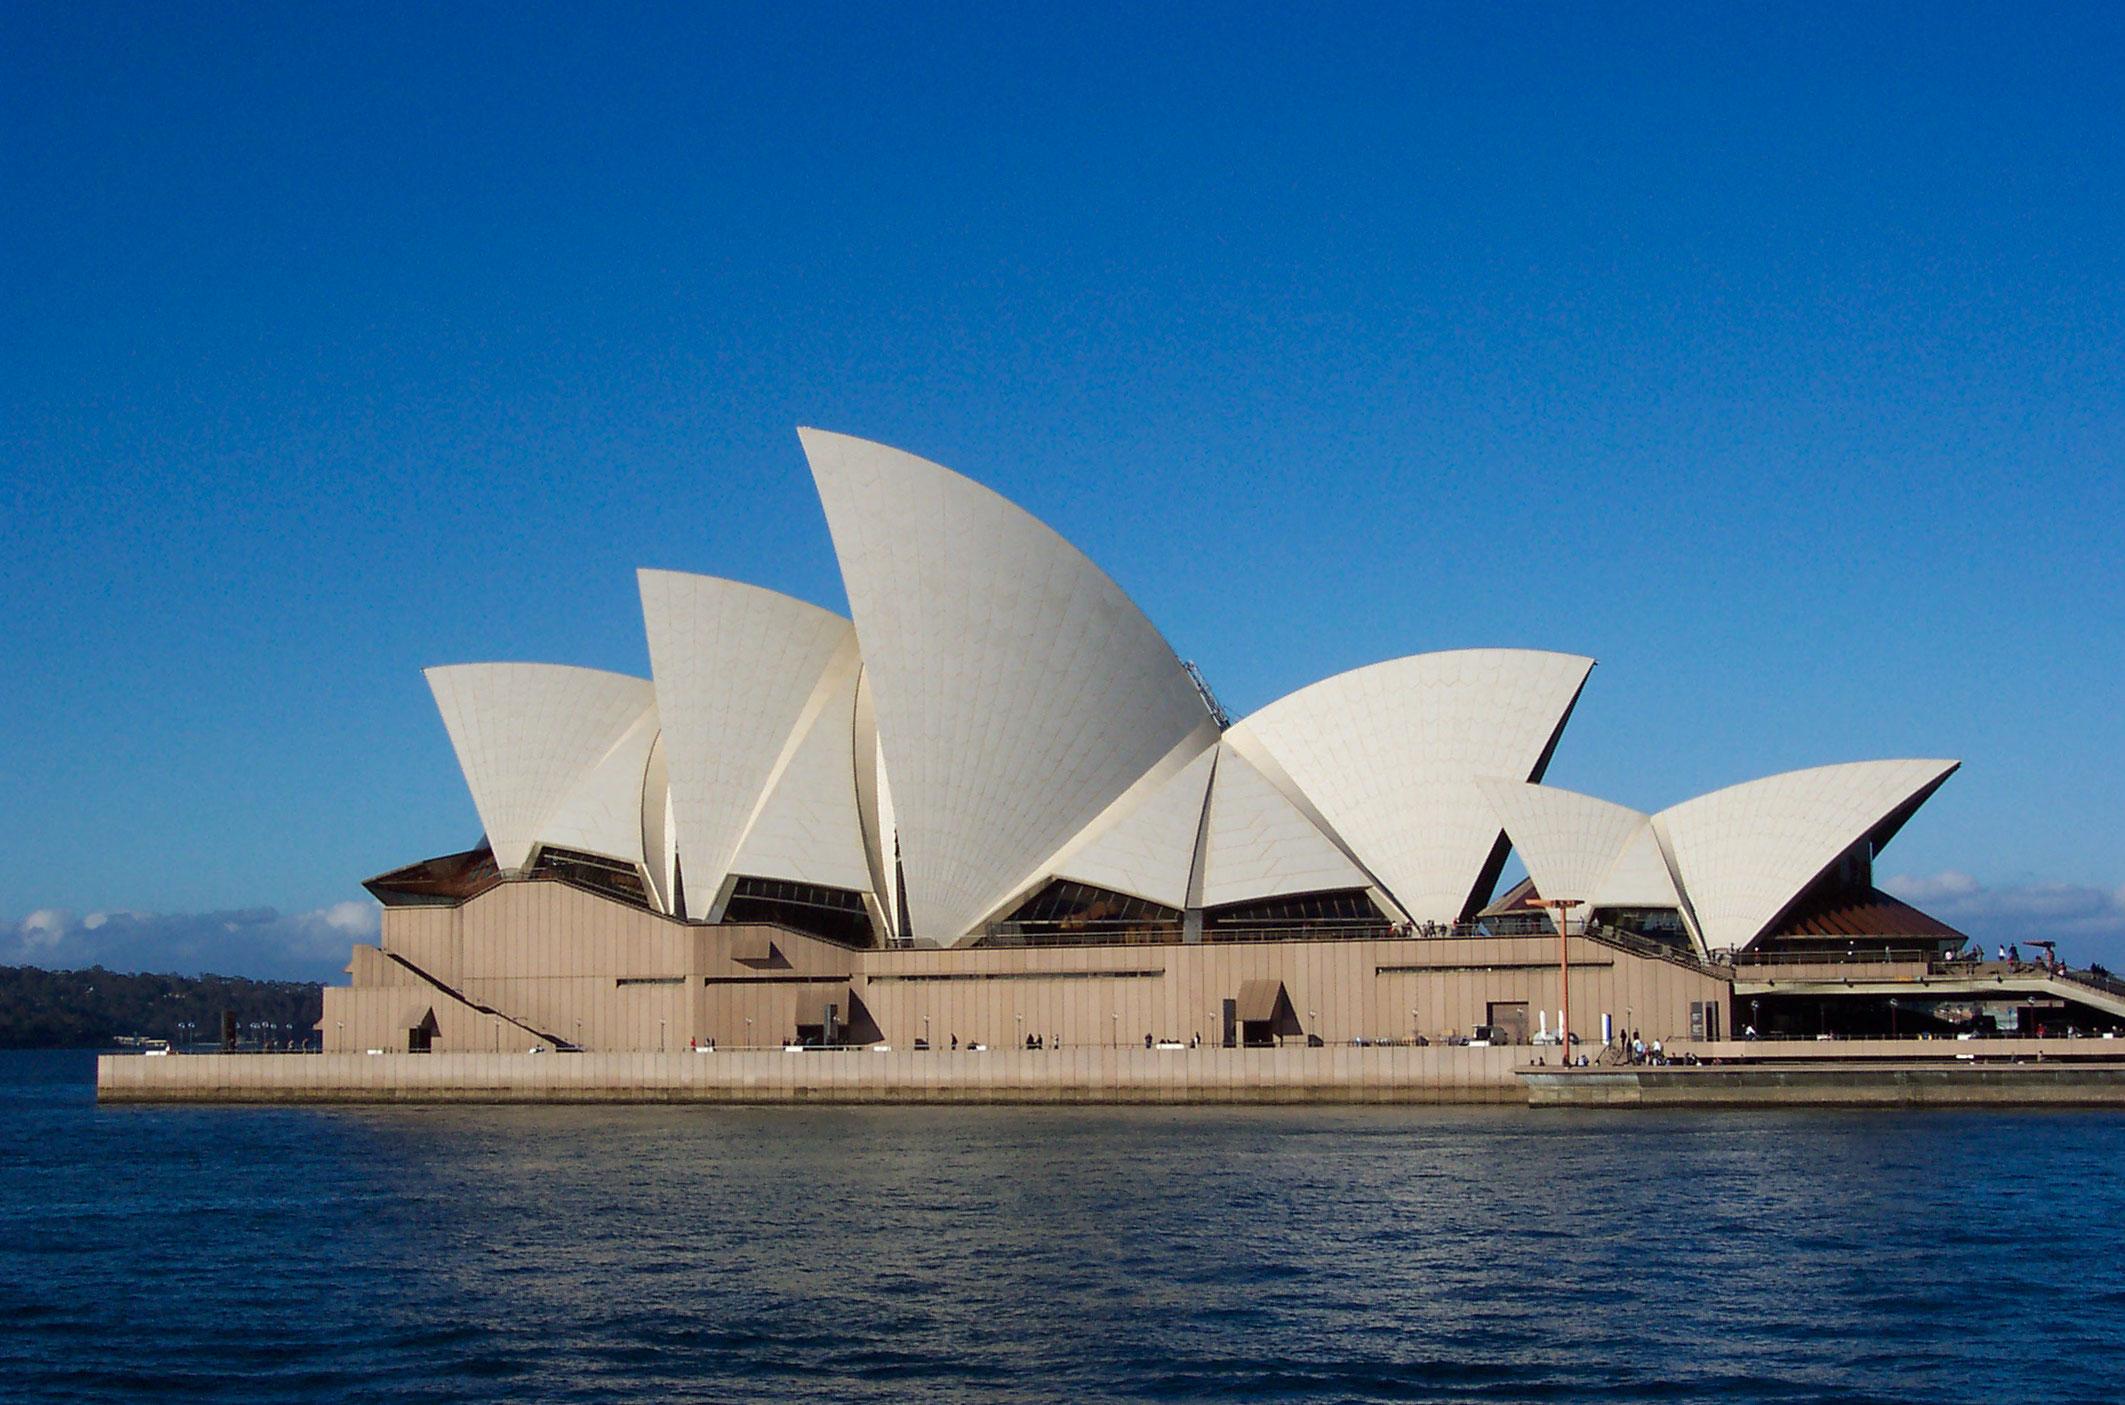 Pin Sydney Aquarium Entry 1 Day Peterpans Adventure Travel Australia ...